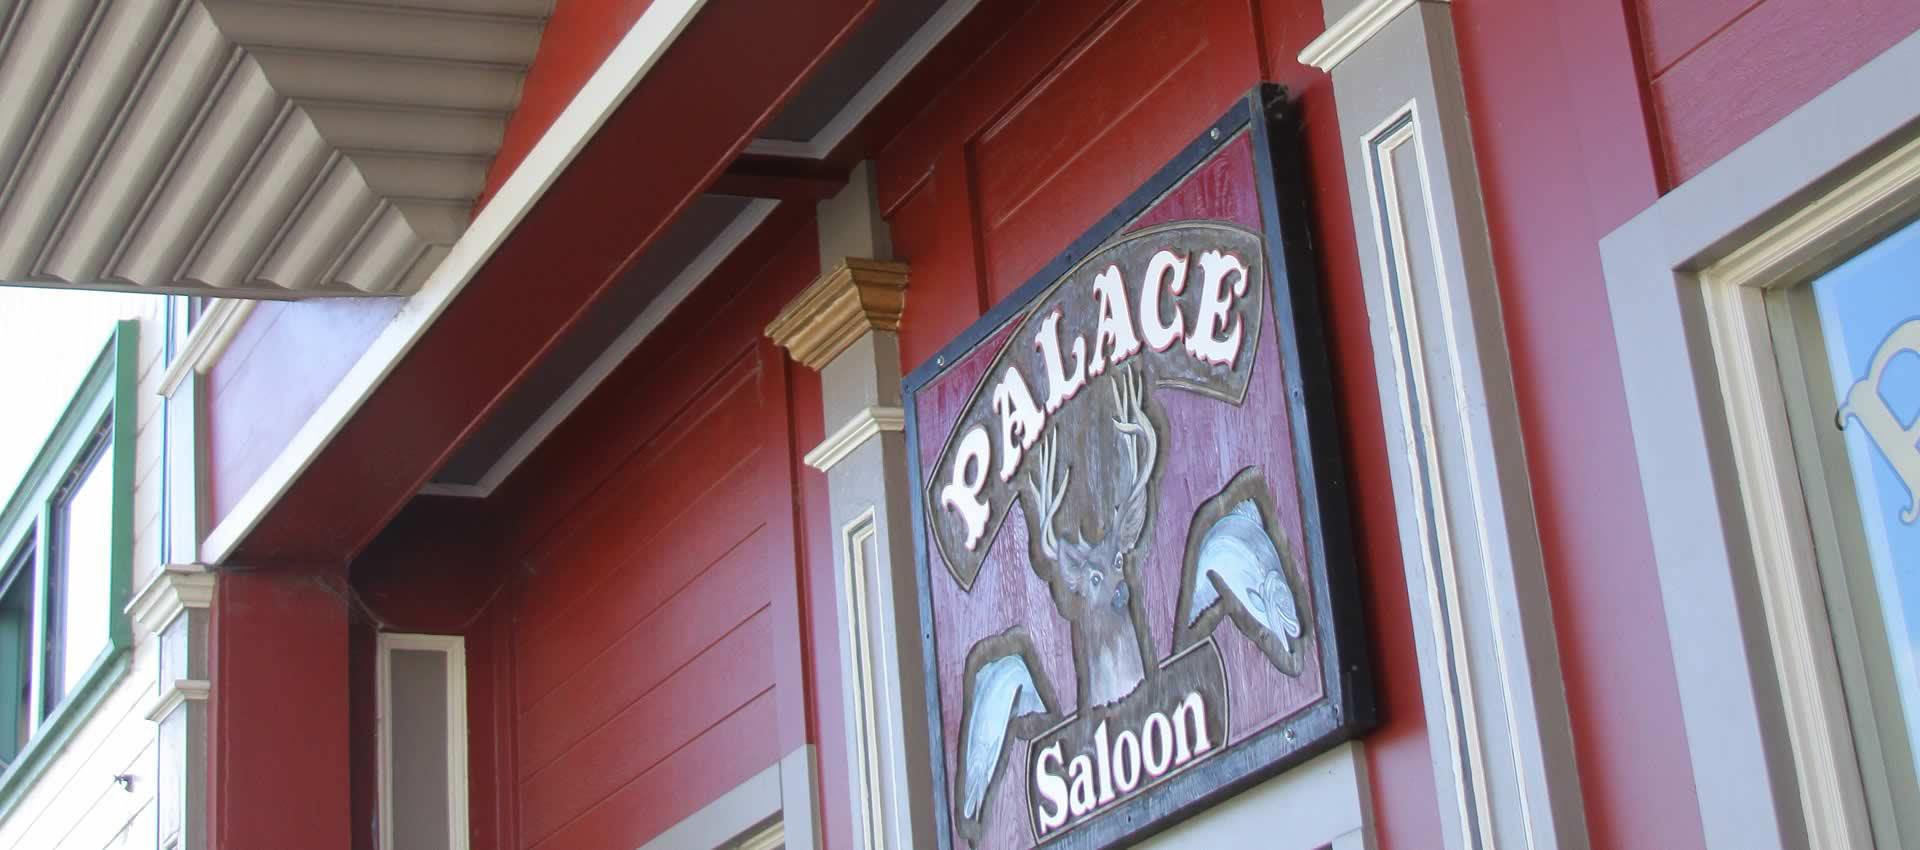 redwood-suites-ocean-saloon